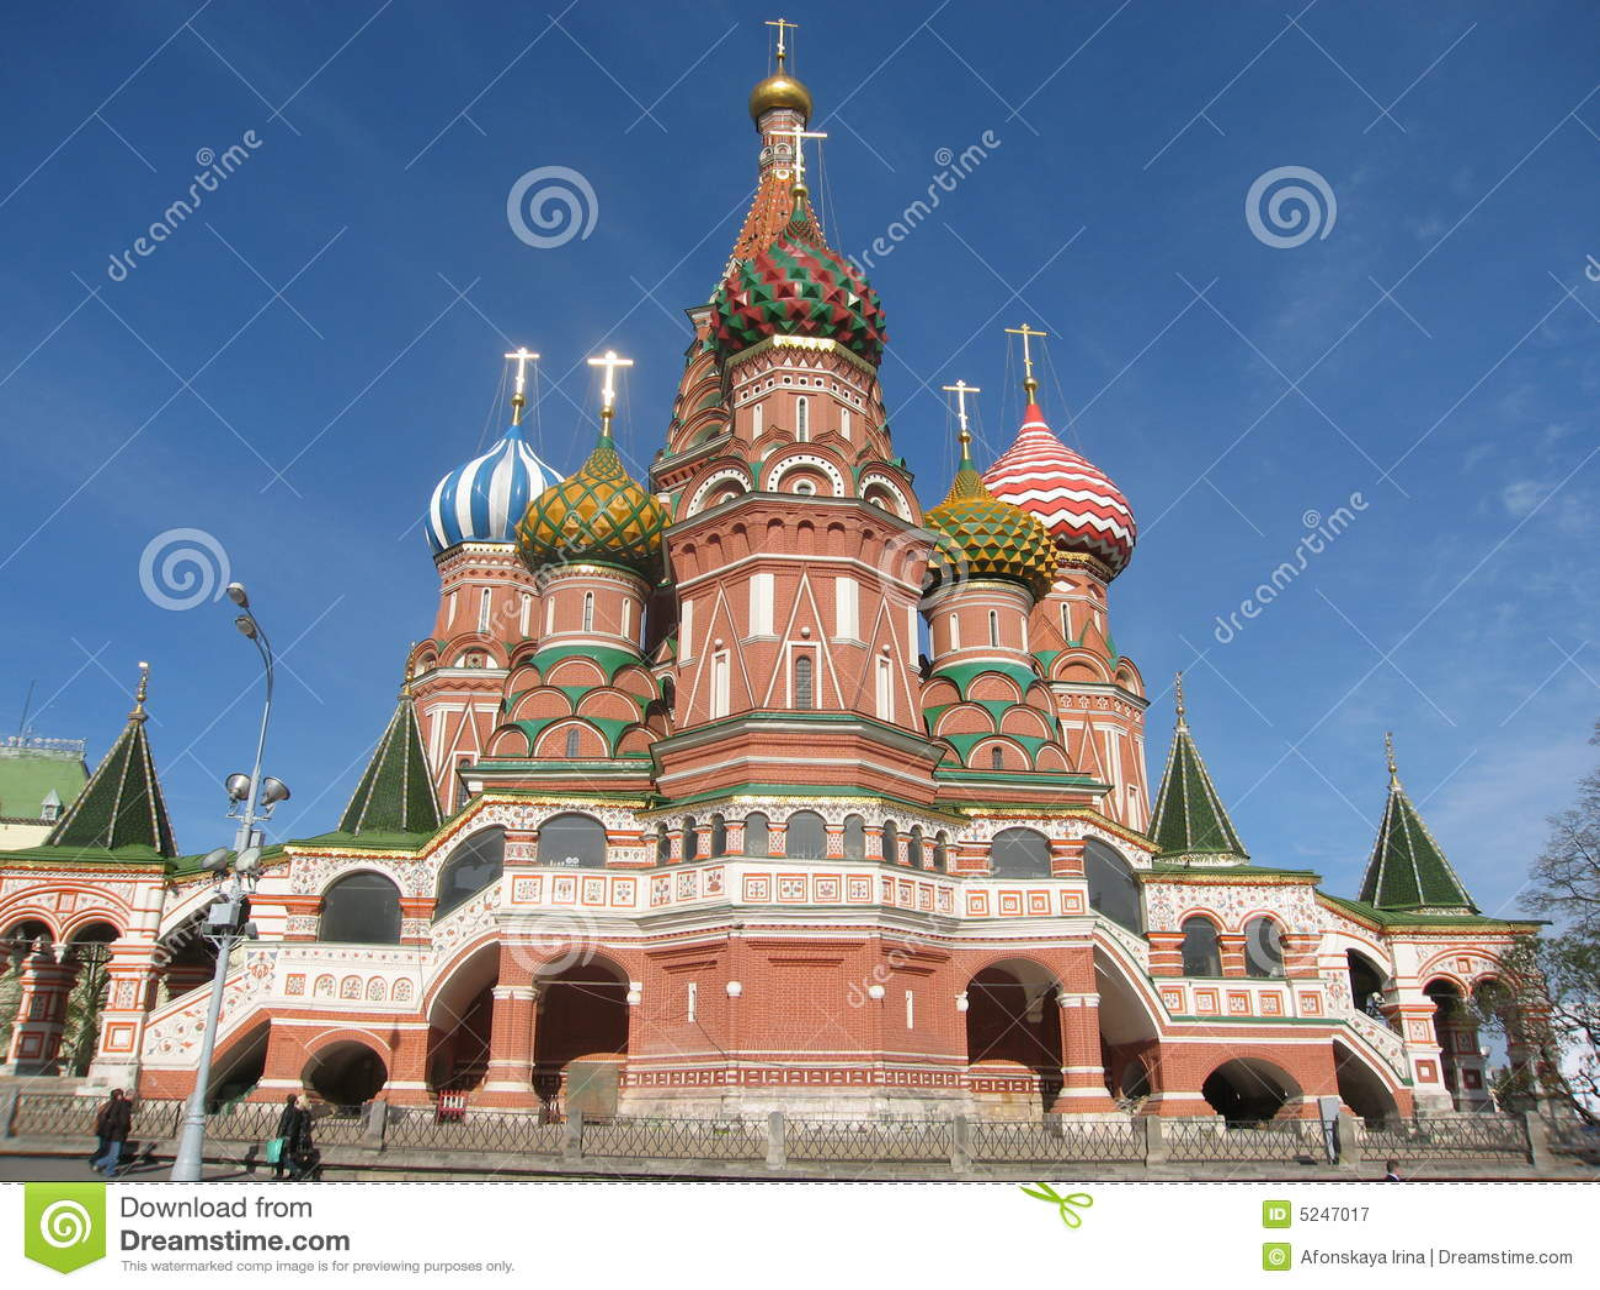 Stock fotografie: moskou, rusland, (pokrovskiy) kathedraal st.basil